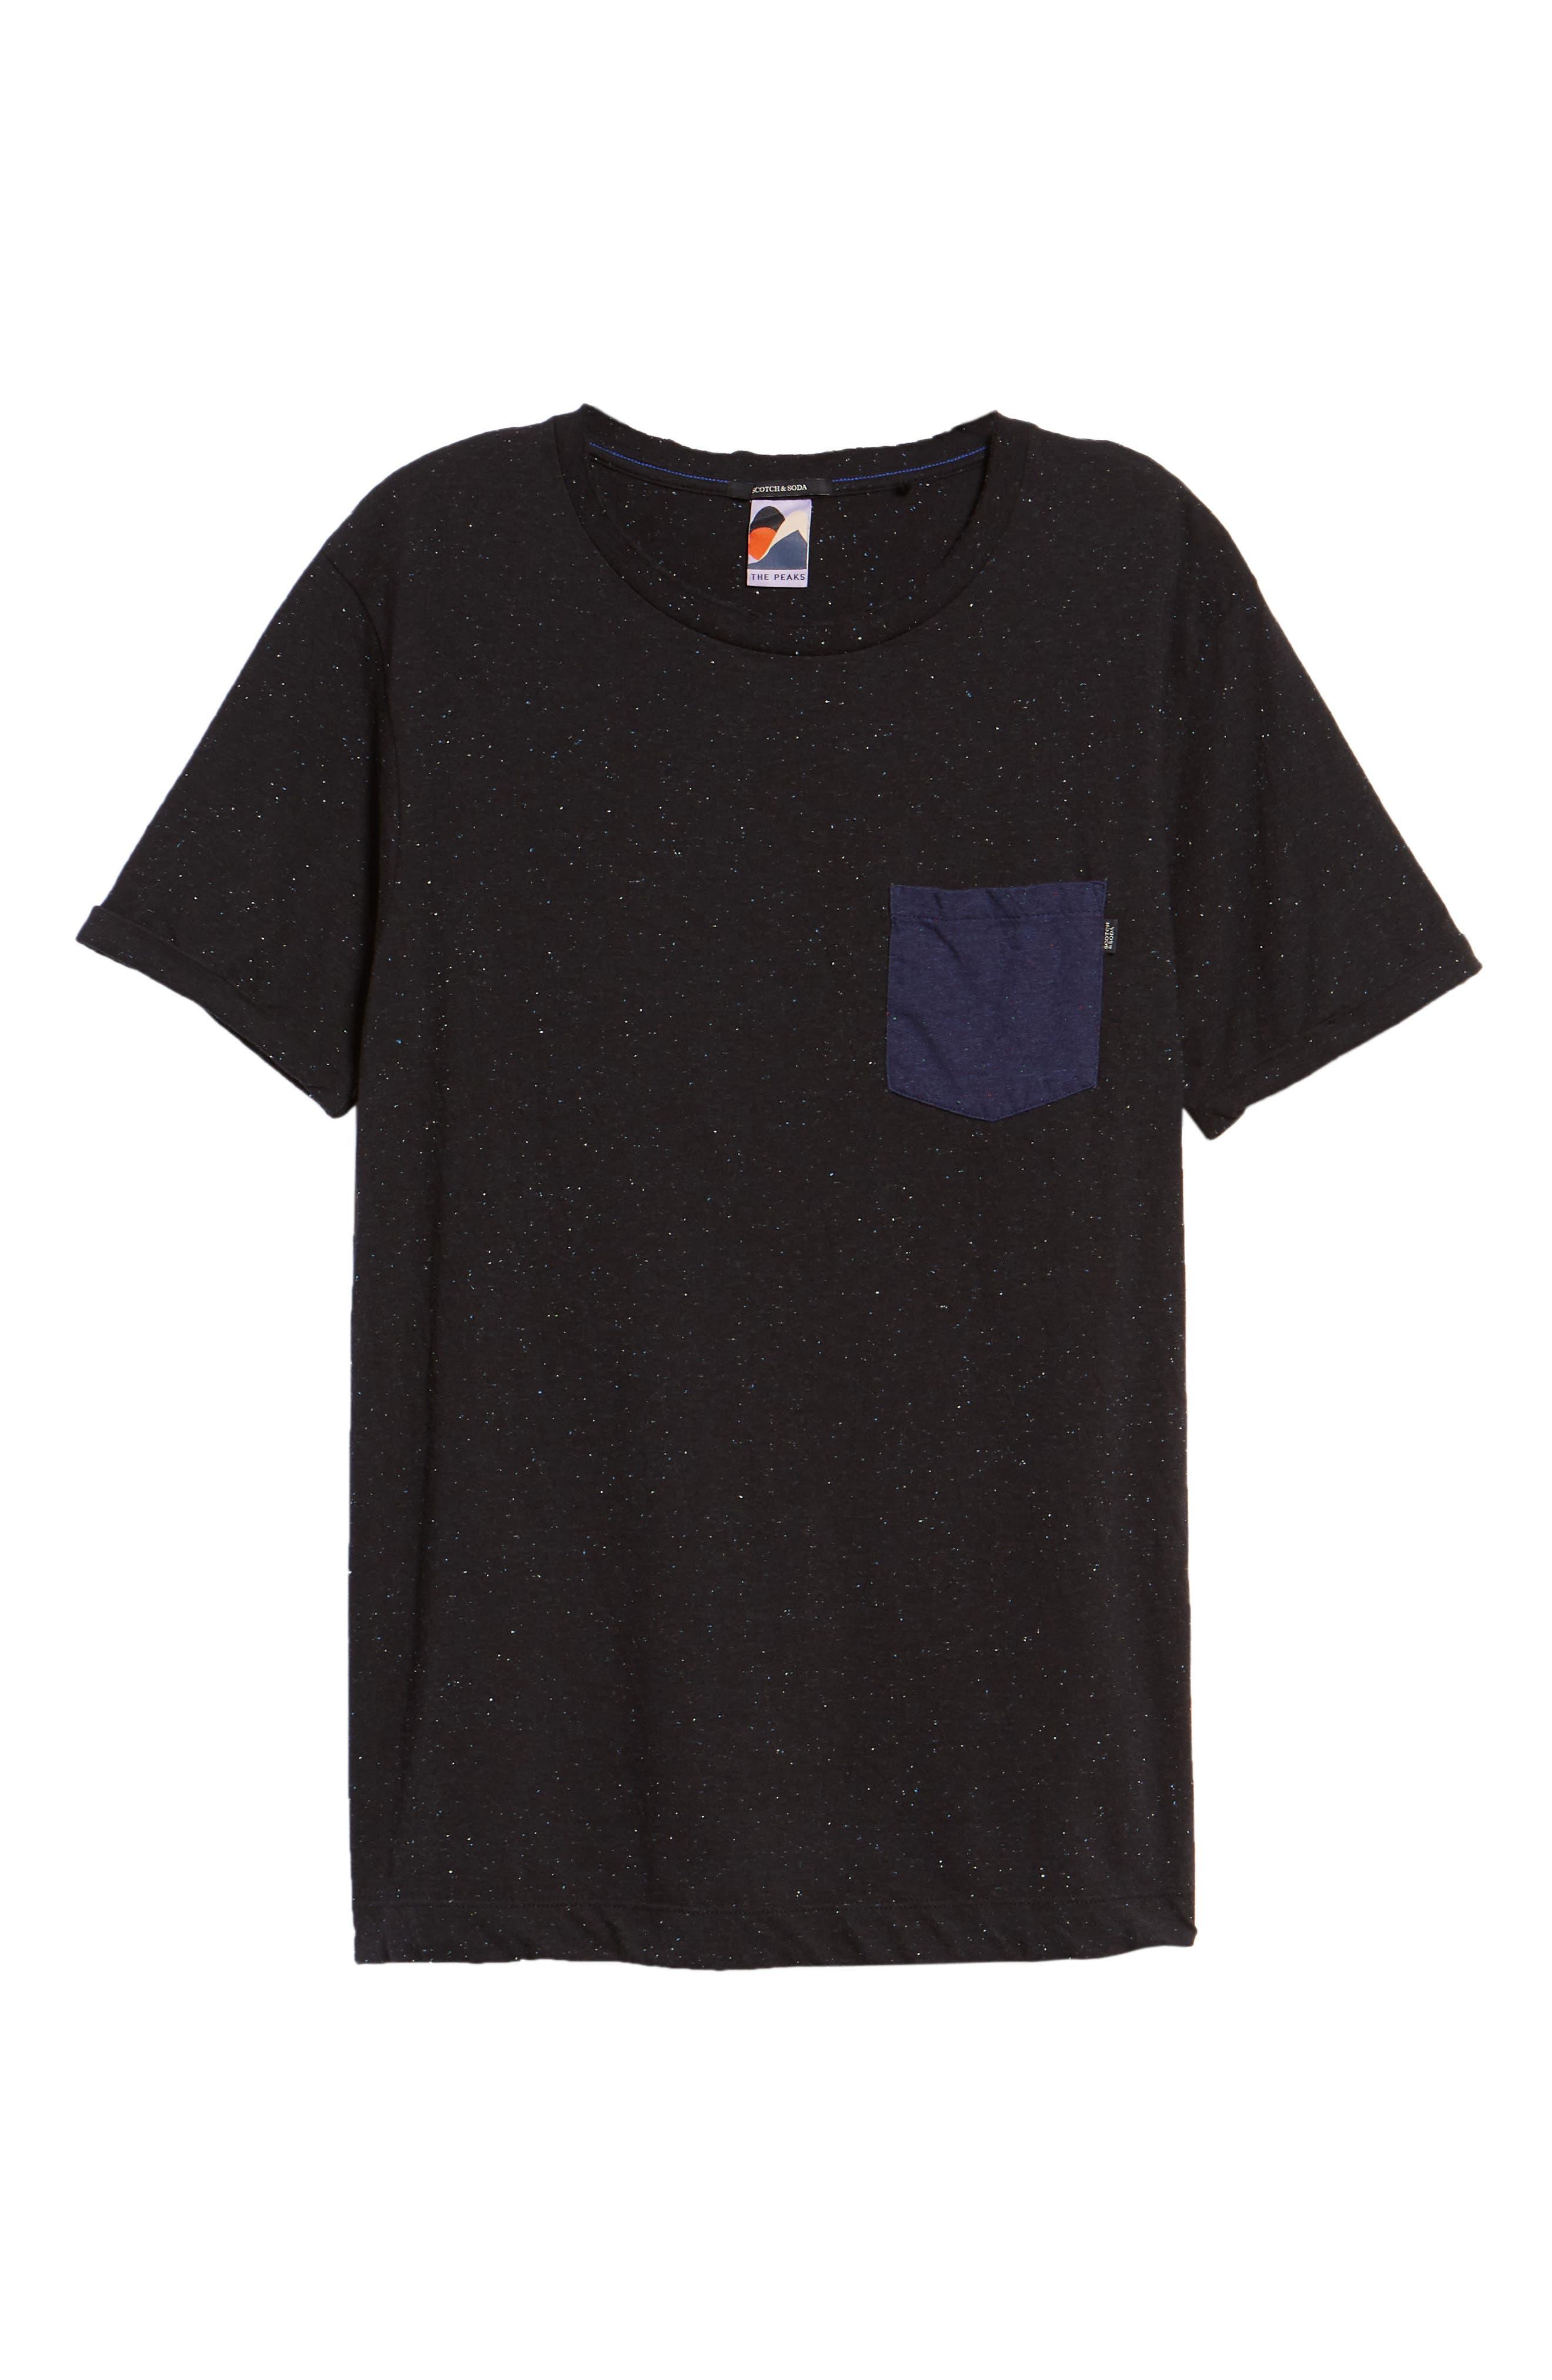 Nep Jersey Pocket T-Shirt,                             Alternate thumbnail 6, color,                             BLACK MELANGE